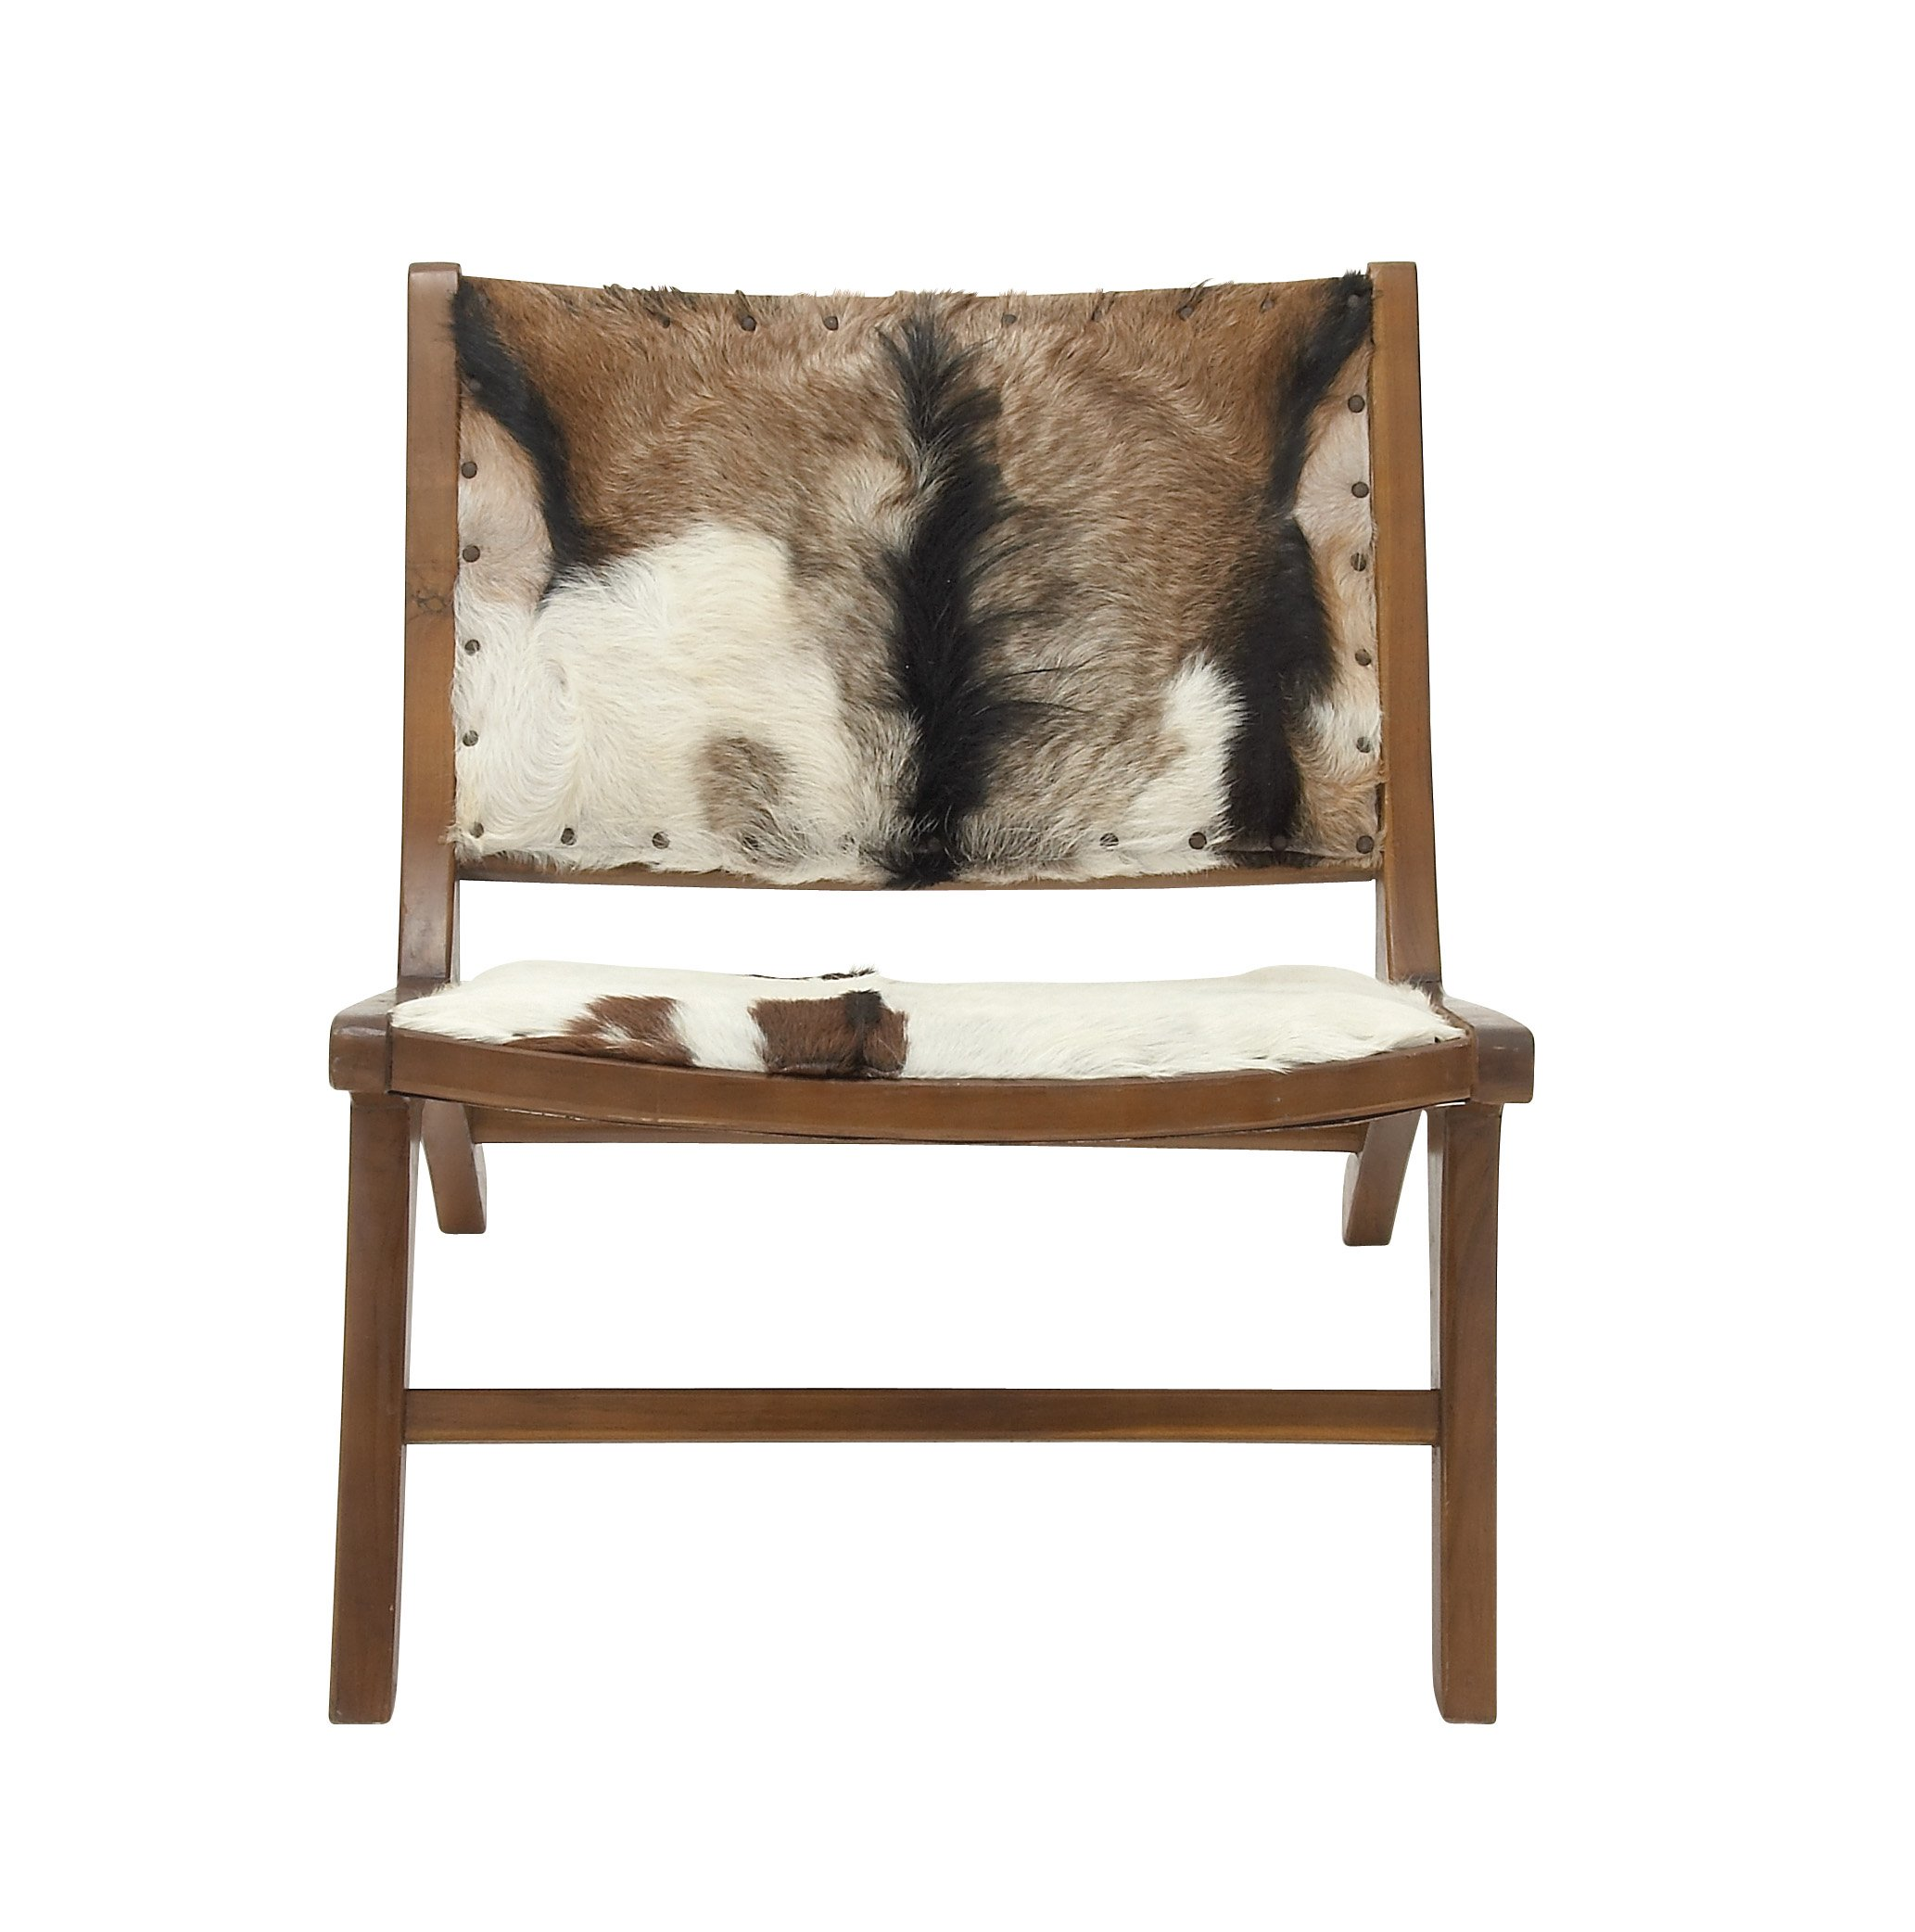 Deco 79 37794 Teak Hide Lounge Chair, 32'' x 27''